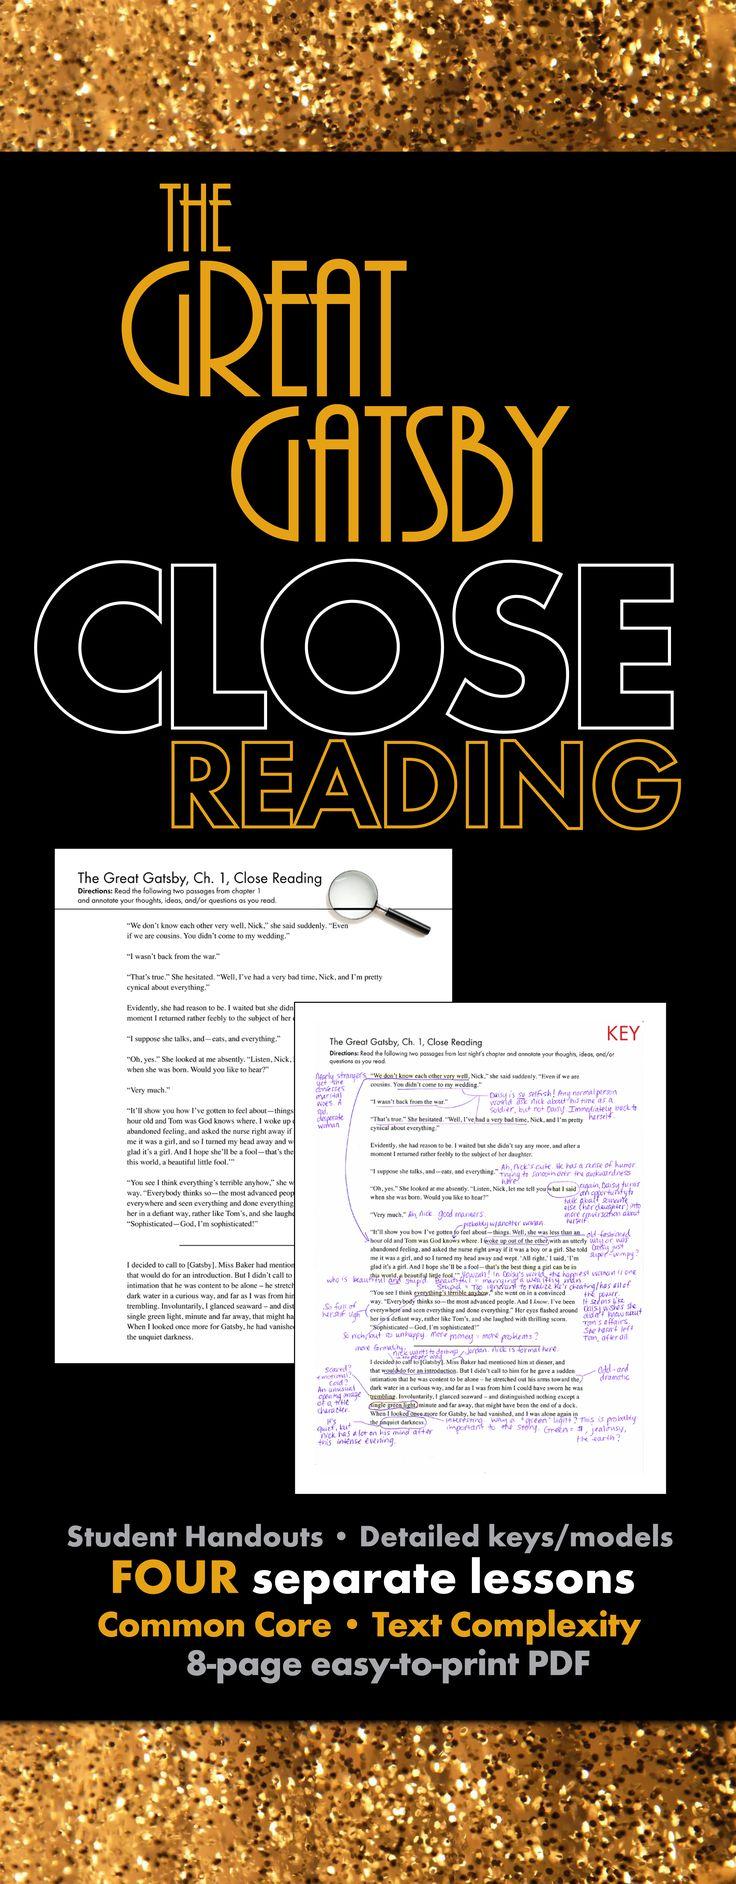 great gatsby commentary f scott fitzgerald's use Bruccoli, matthew joseph (ed) (2000), f scott fitzgerald's the great gatsby: a literary reference, new york: carroll & graf publishers.